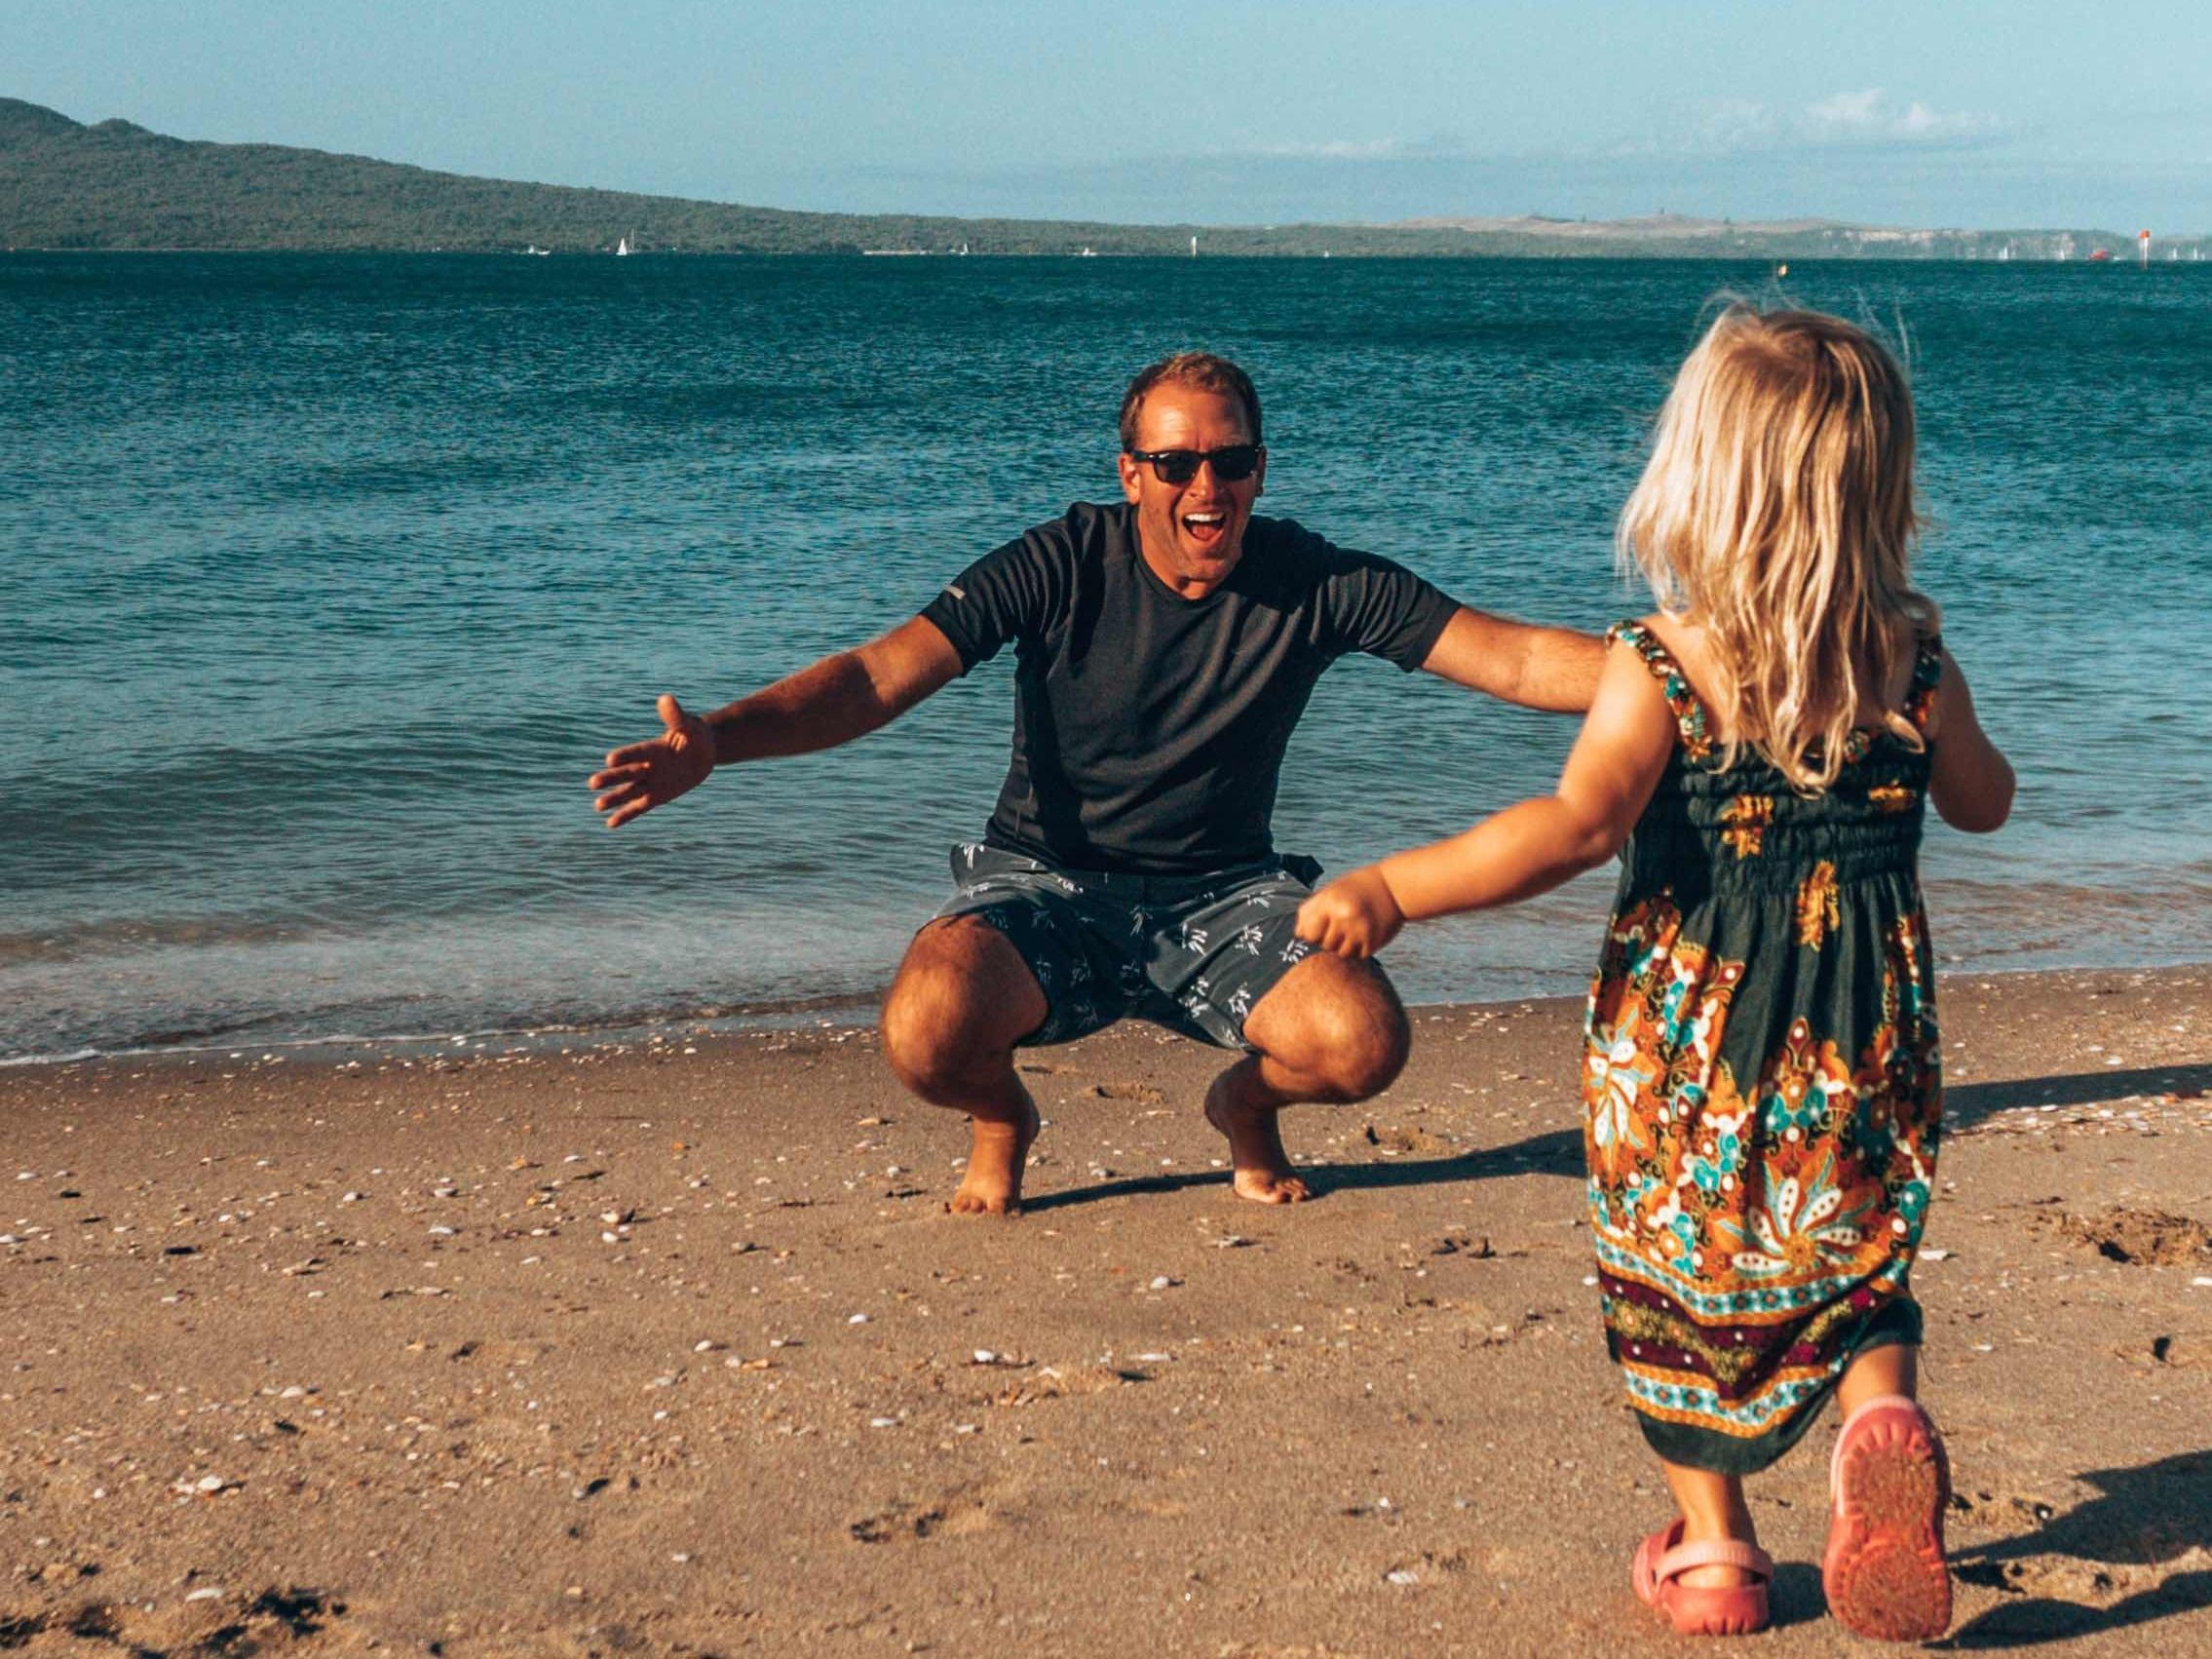 Beach_dad_daughter_girl_sunset_hugs.jpg